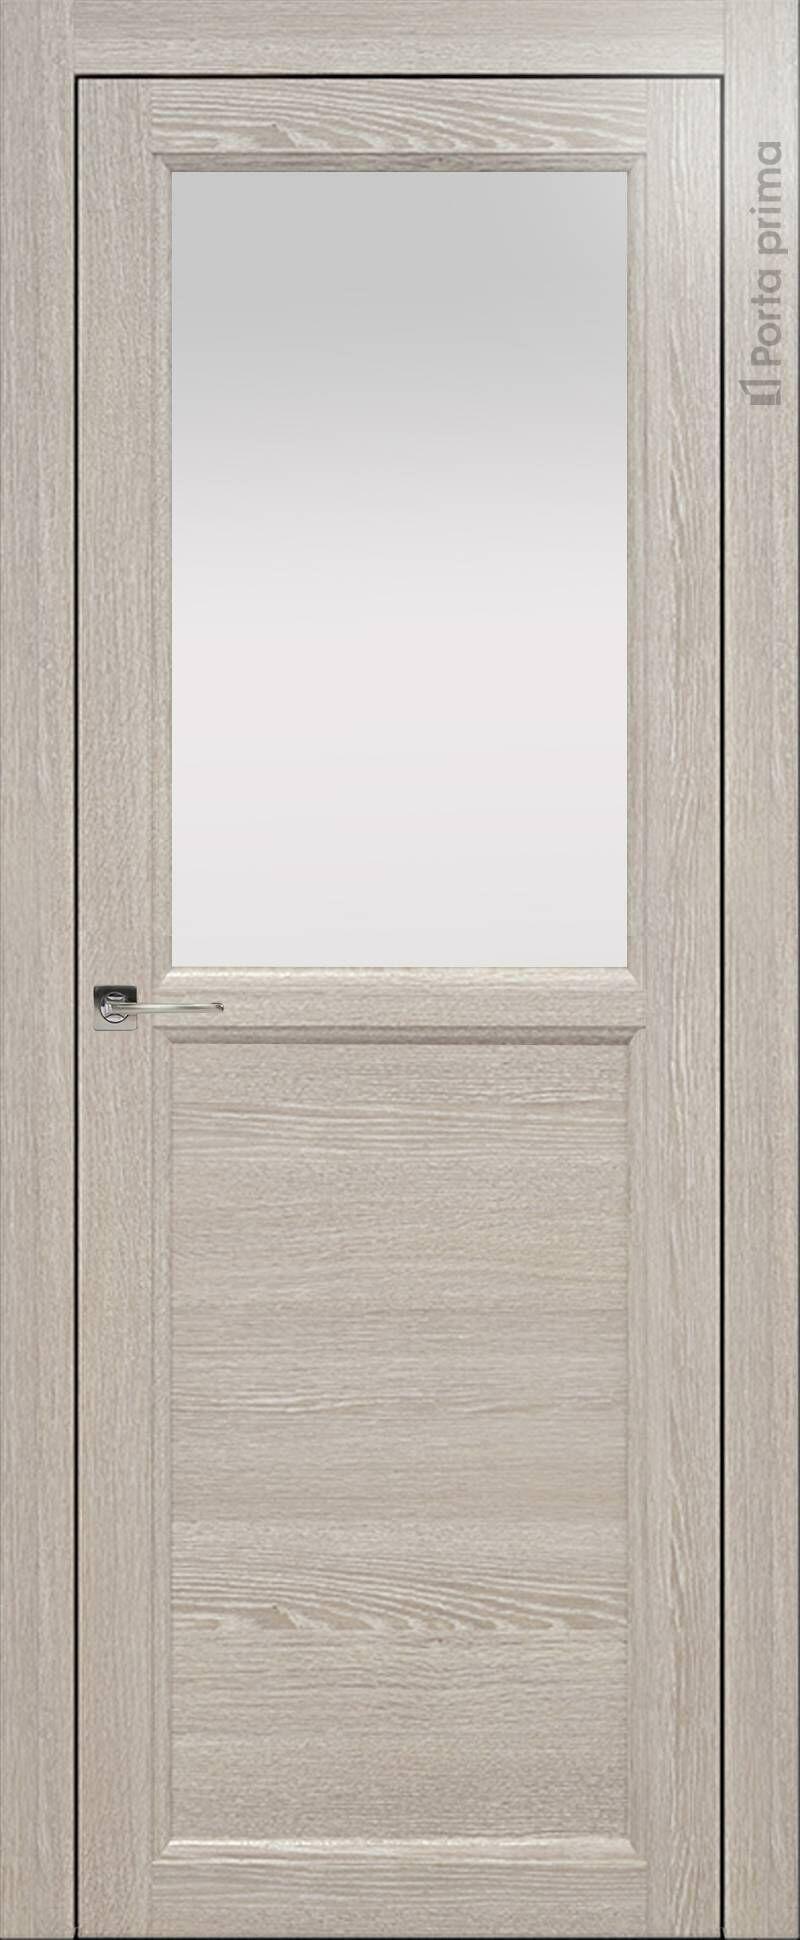 Sorrento-R Б1 цвет - Серый дуб Со стеклом (ДО)